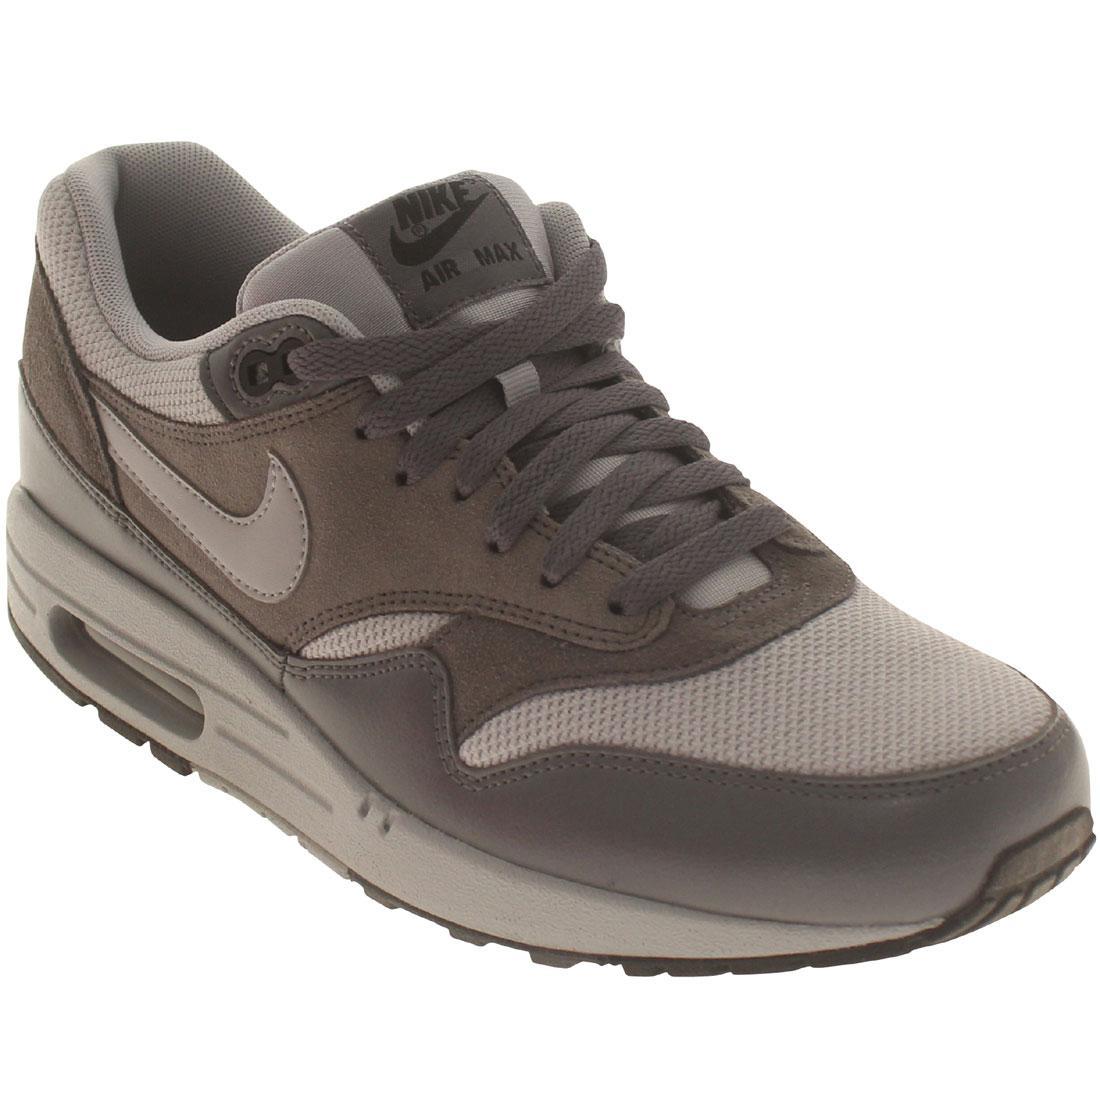 on sale 653fe a3e87 ... 537383-019 Nike Men Air Max Max Max 1 Essential gray wolf grey dark  grey ...